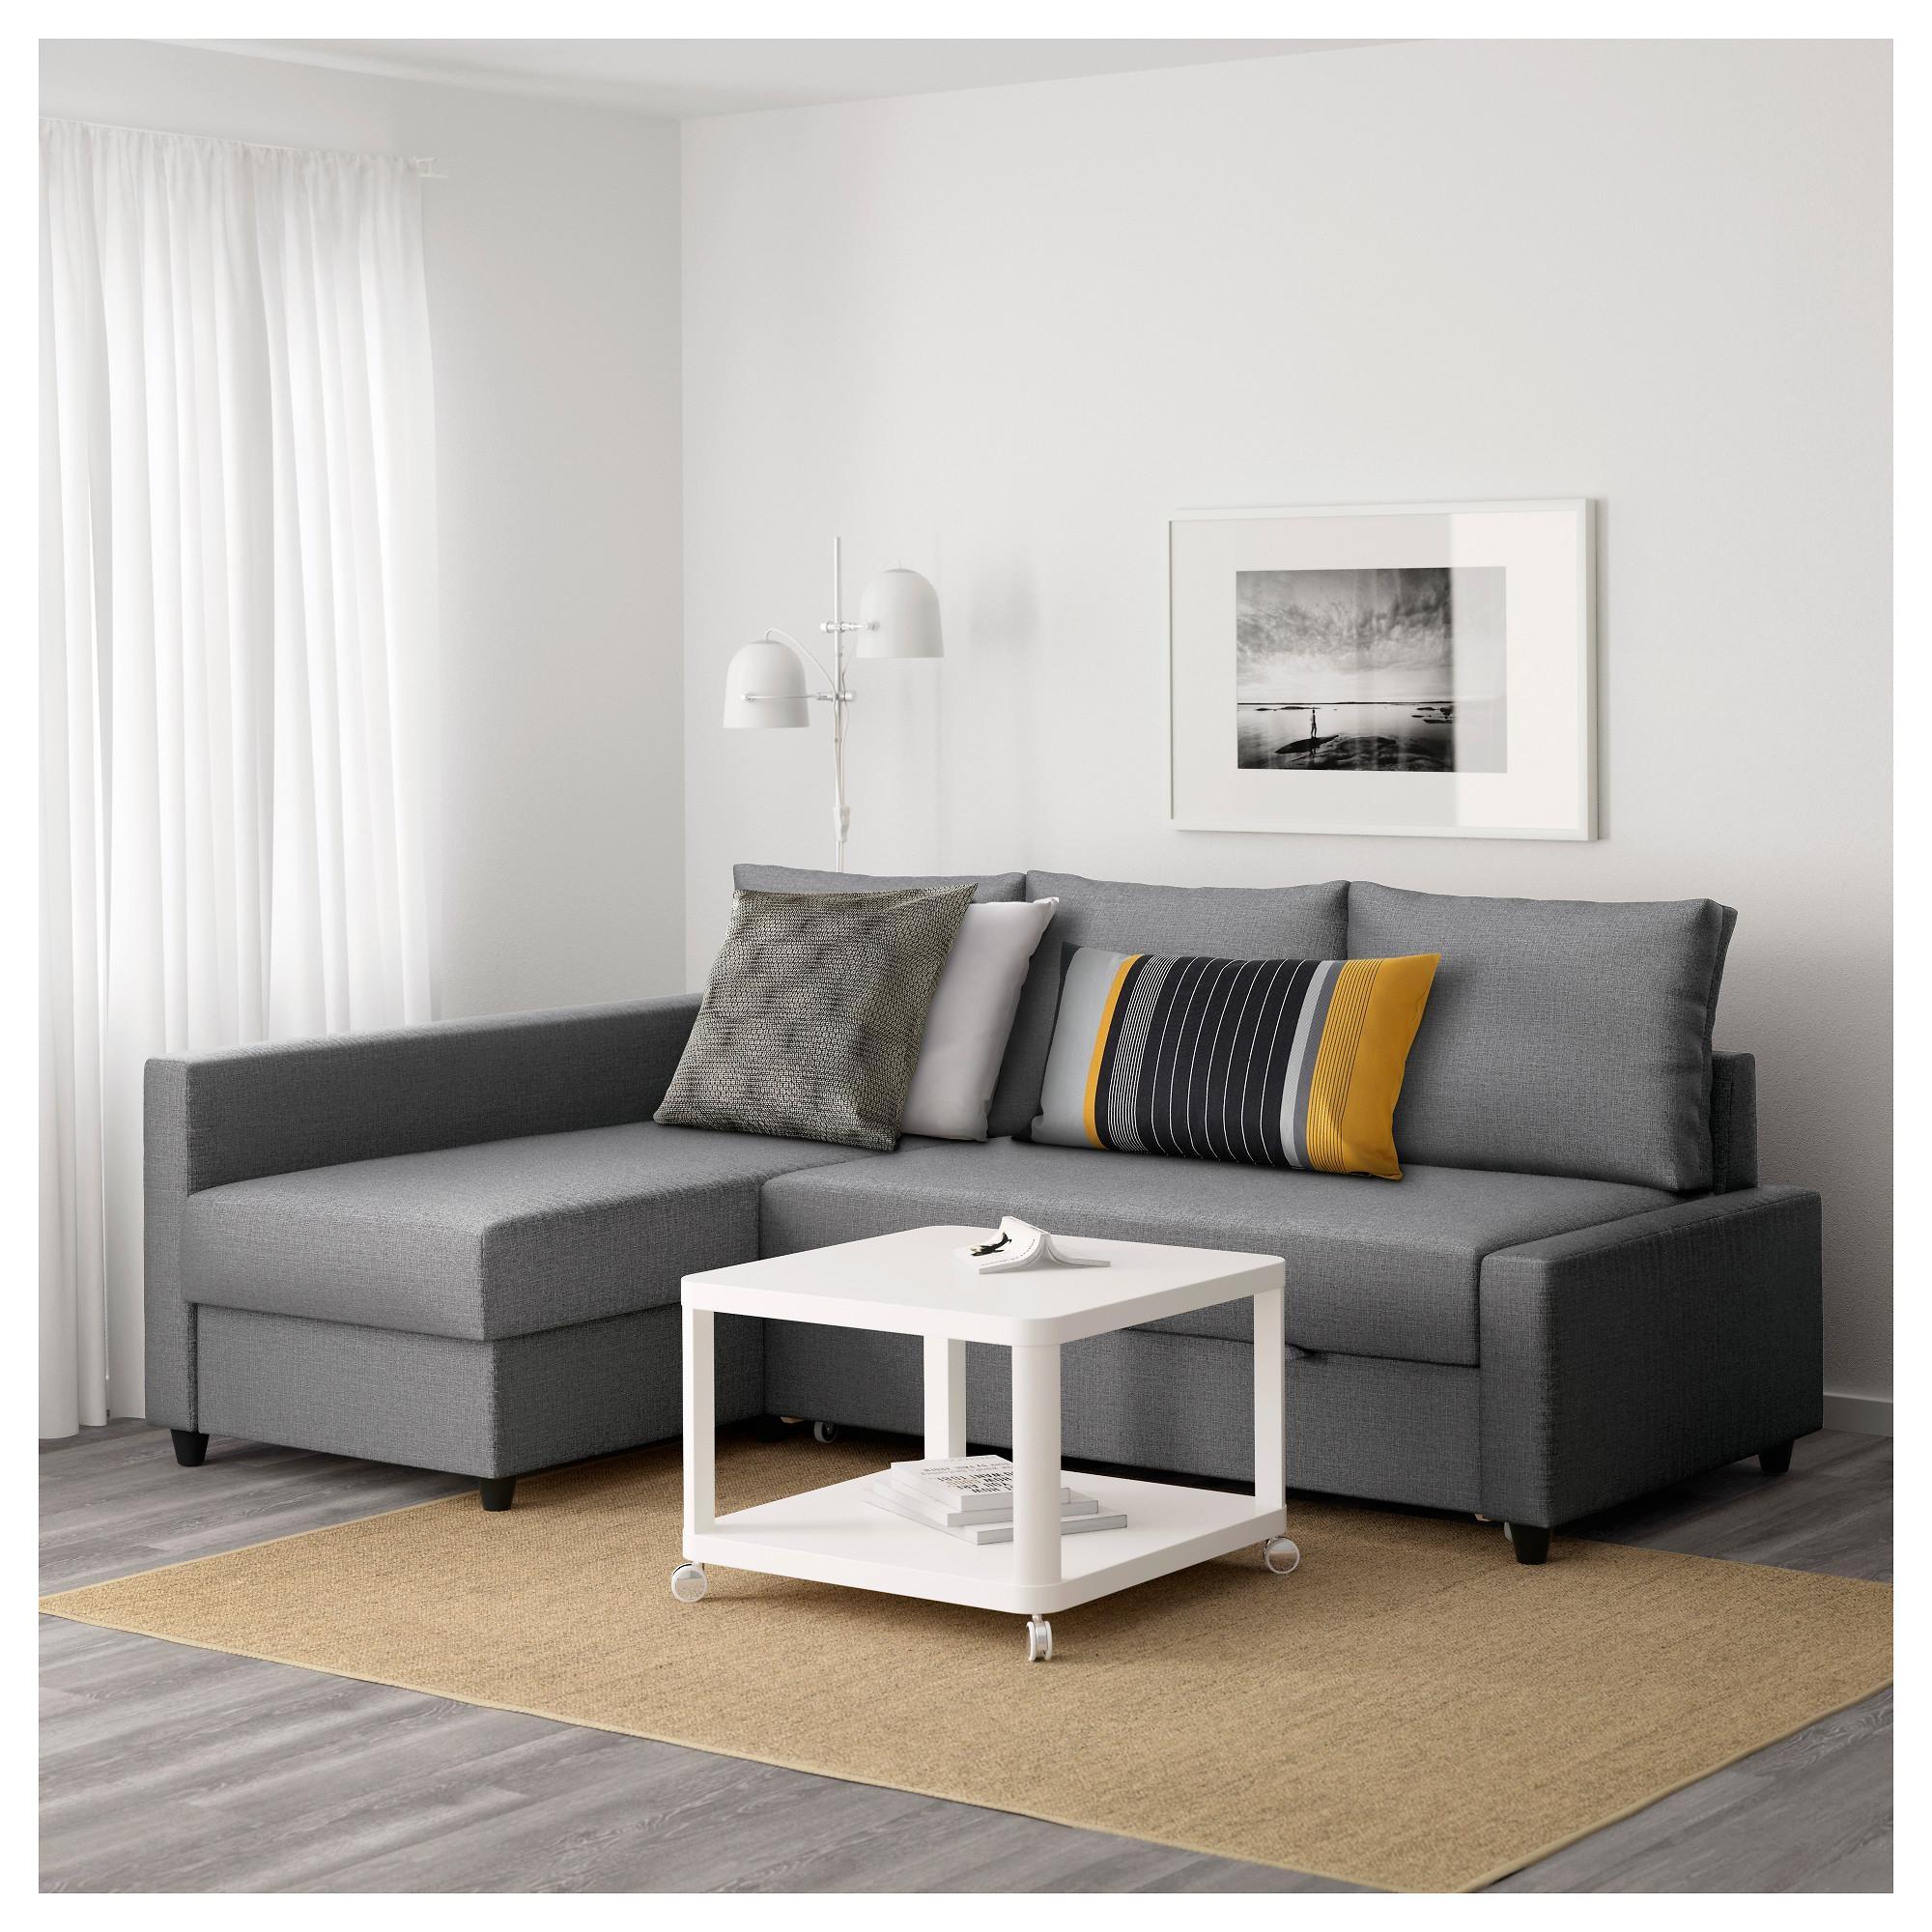 Friheten Corner Sofa Bed With Storage Skiftebo Dark Grey – Ikea Regarding Corner Sofa Beds (Image 11 of 20)